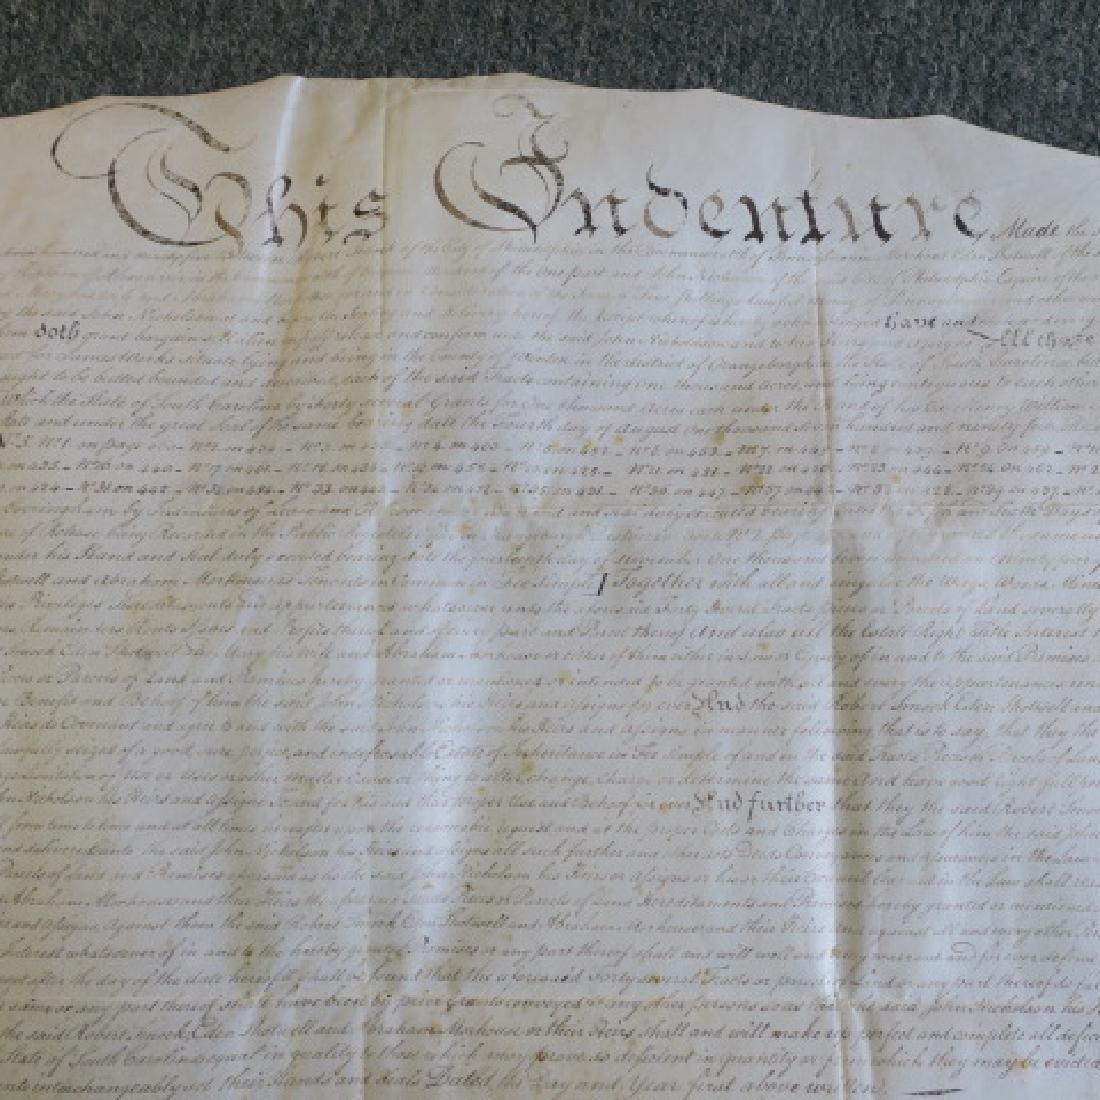 PENNSYLVANIA LAND GRANT, JOHN NICHOLSON, 1795: - 4